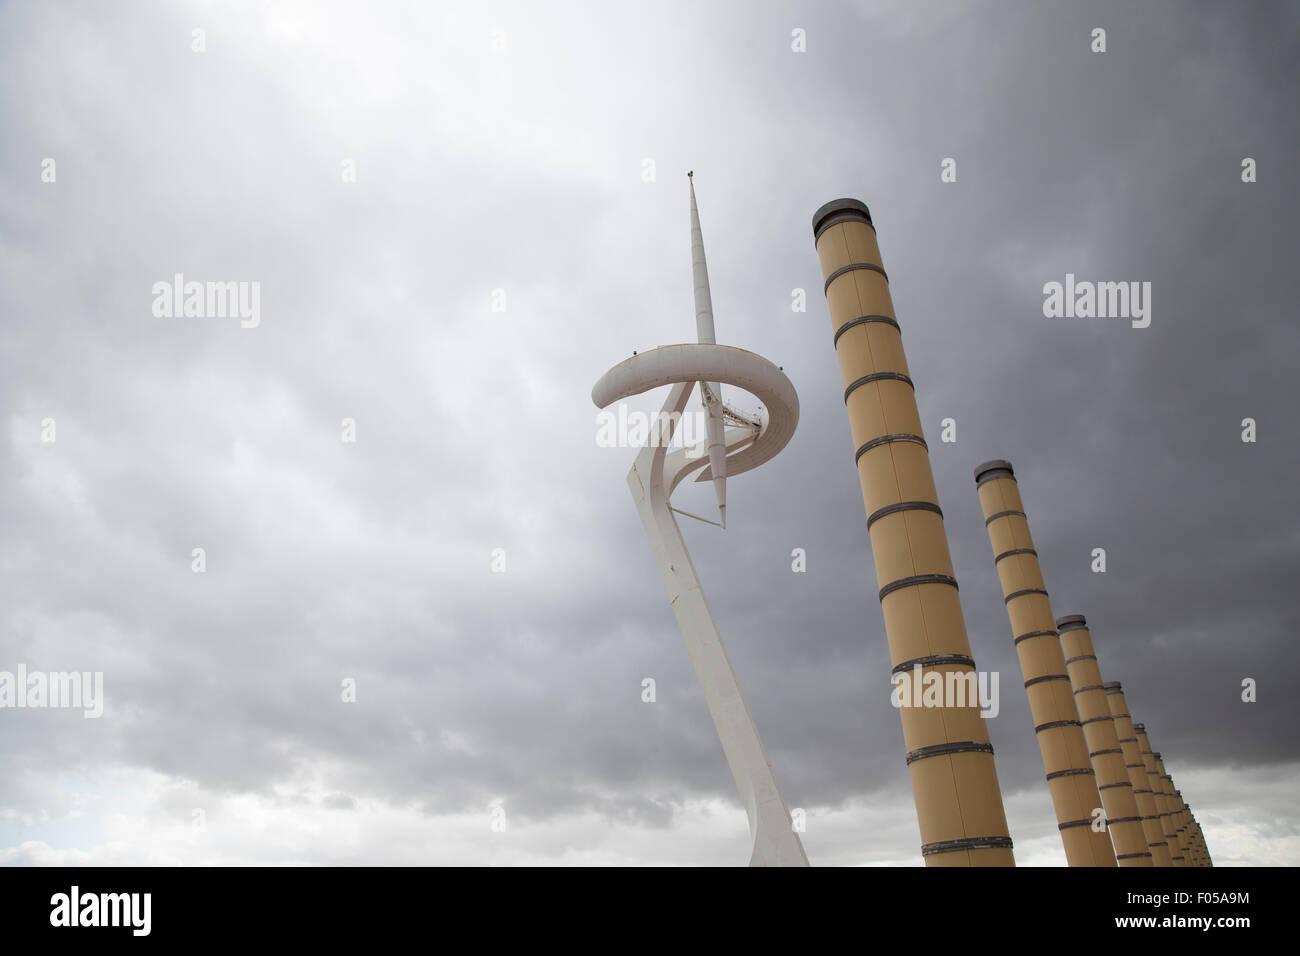 Barcelona Communication Tower on Mont Juic - Stock Image